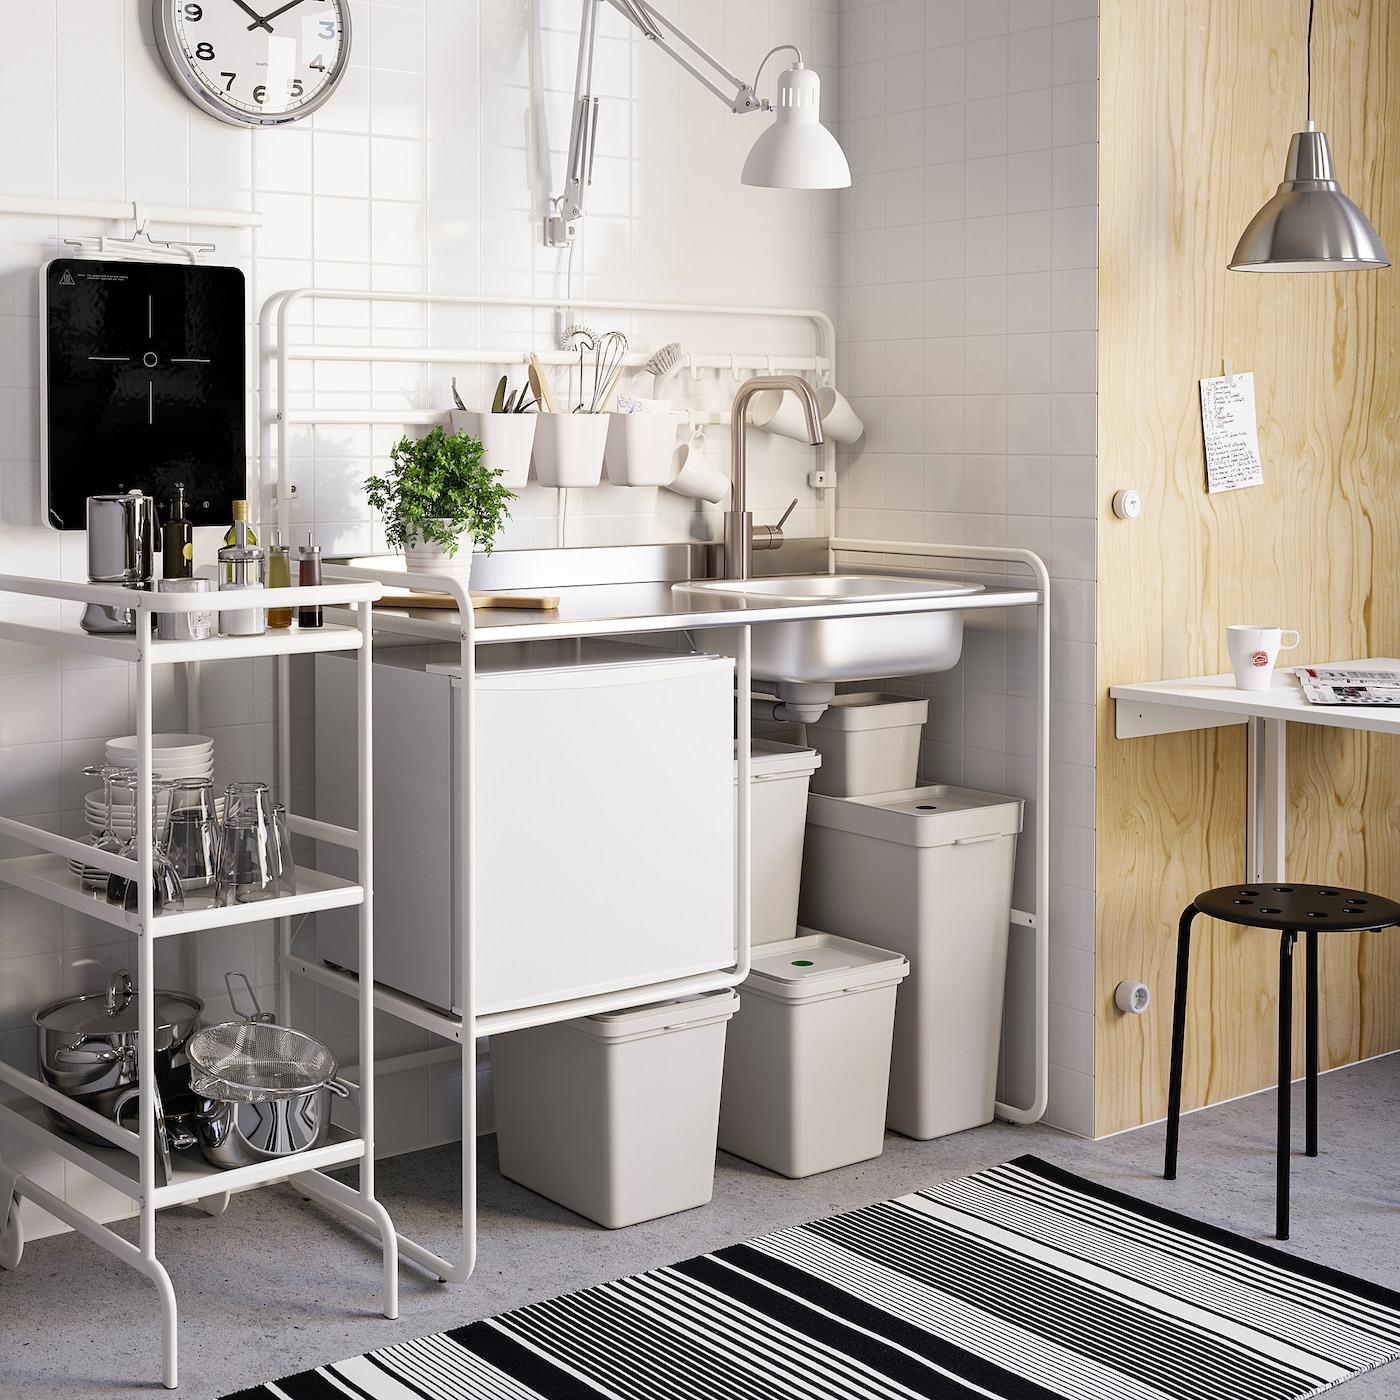 Full Size of Ikea Kchen Behlter Mlltrennsysteme Abfalltrennsysteme Fr Abluftventilator Küche Jalousieschrank Edelstahlküche Gebraucht Winkel Rückwand Glas Wohnzimmer Nischenverkleidung Küche Ikea